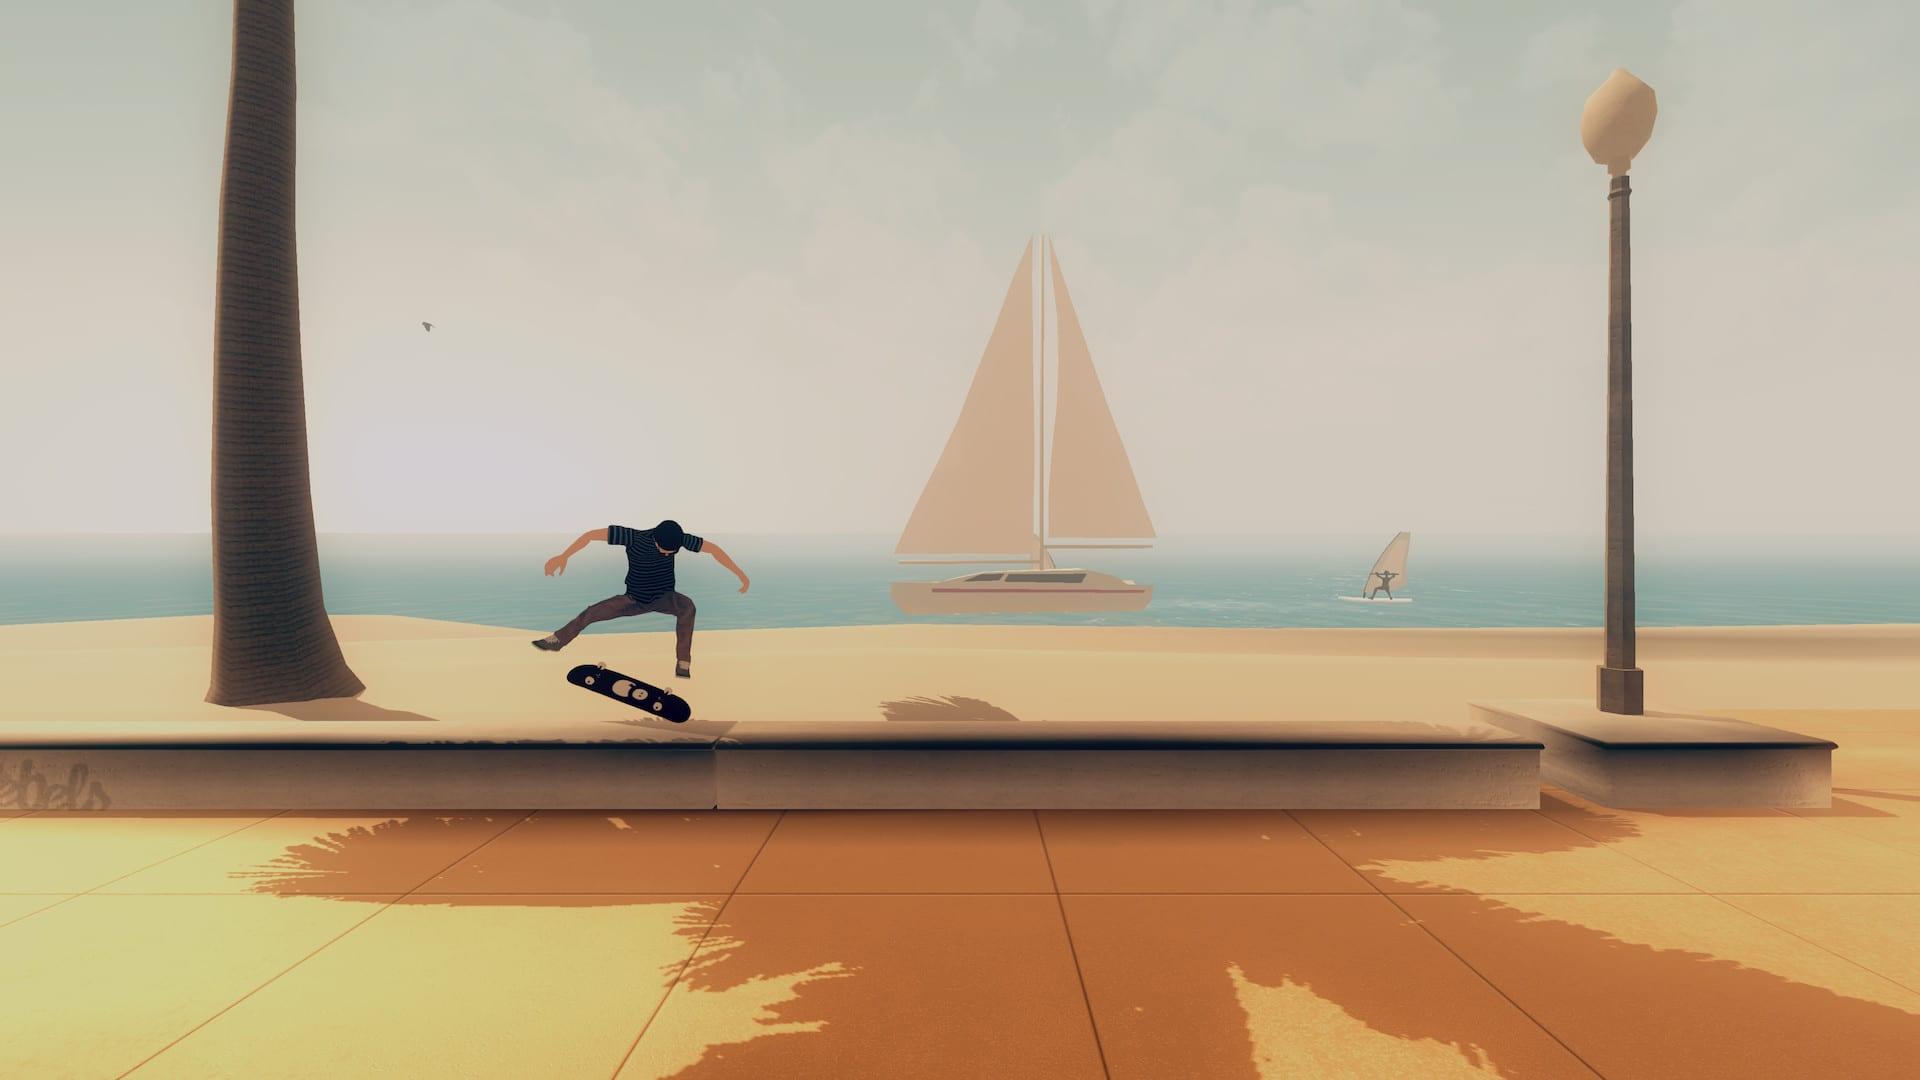 skate city hd wallpaper 74330